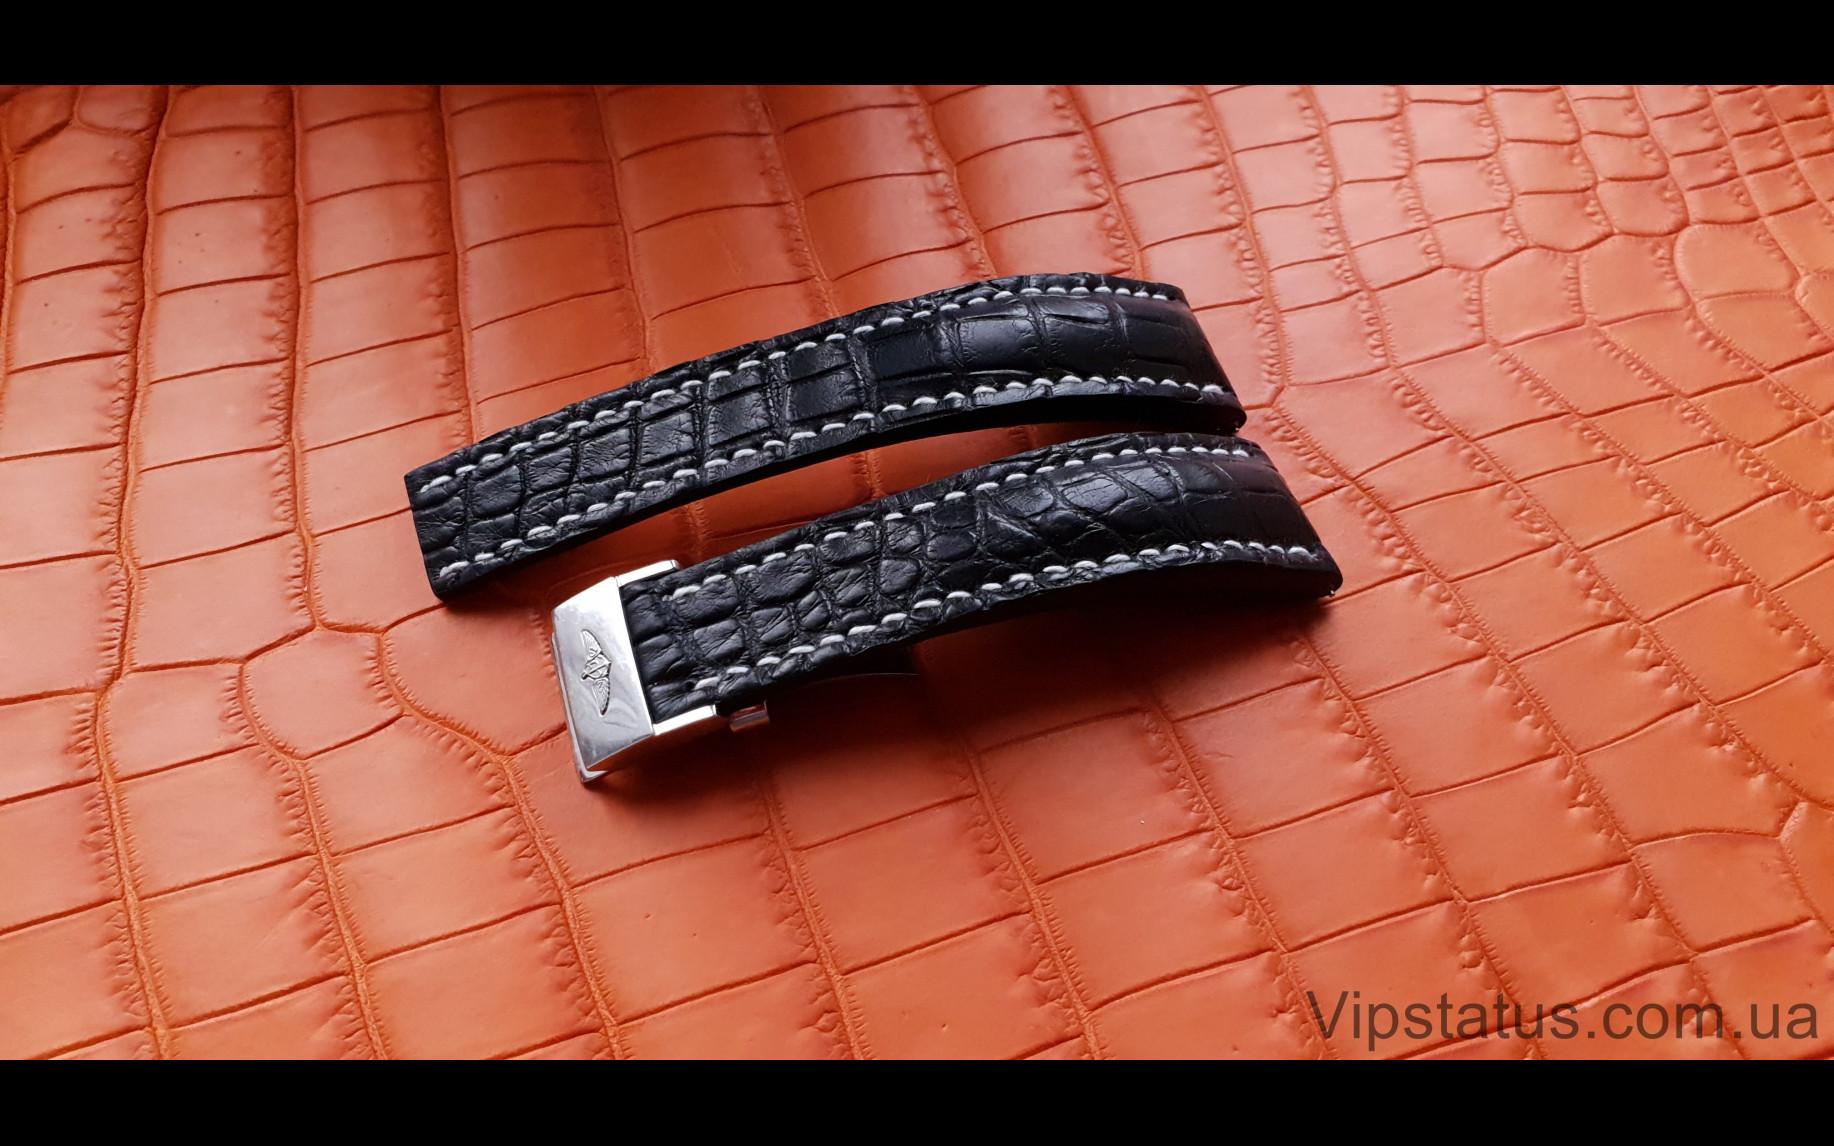 Elite Элитный ремешок для часов Breitling кожа крокодила Elite Crocodile Strap for Breitling watches image 2